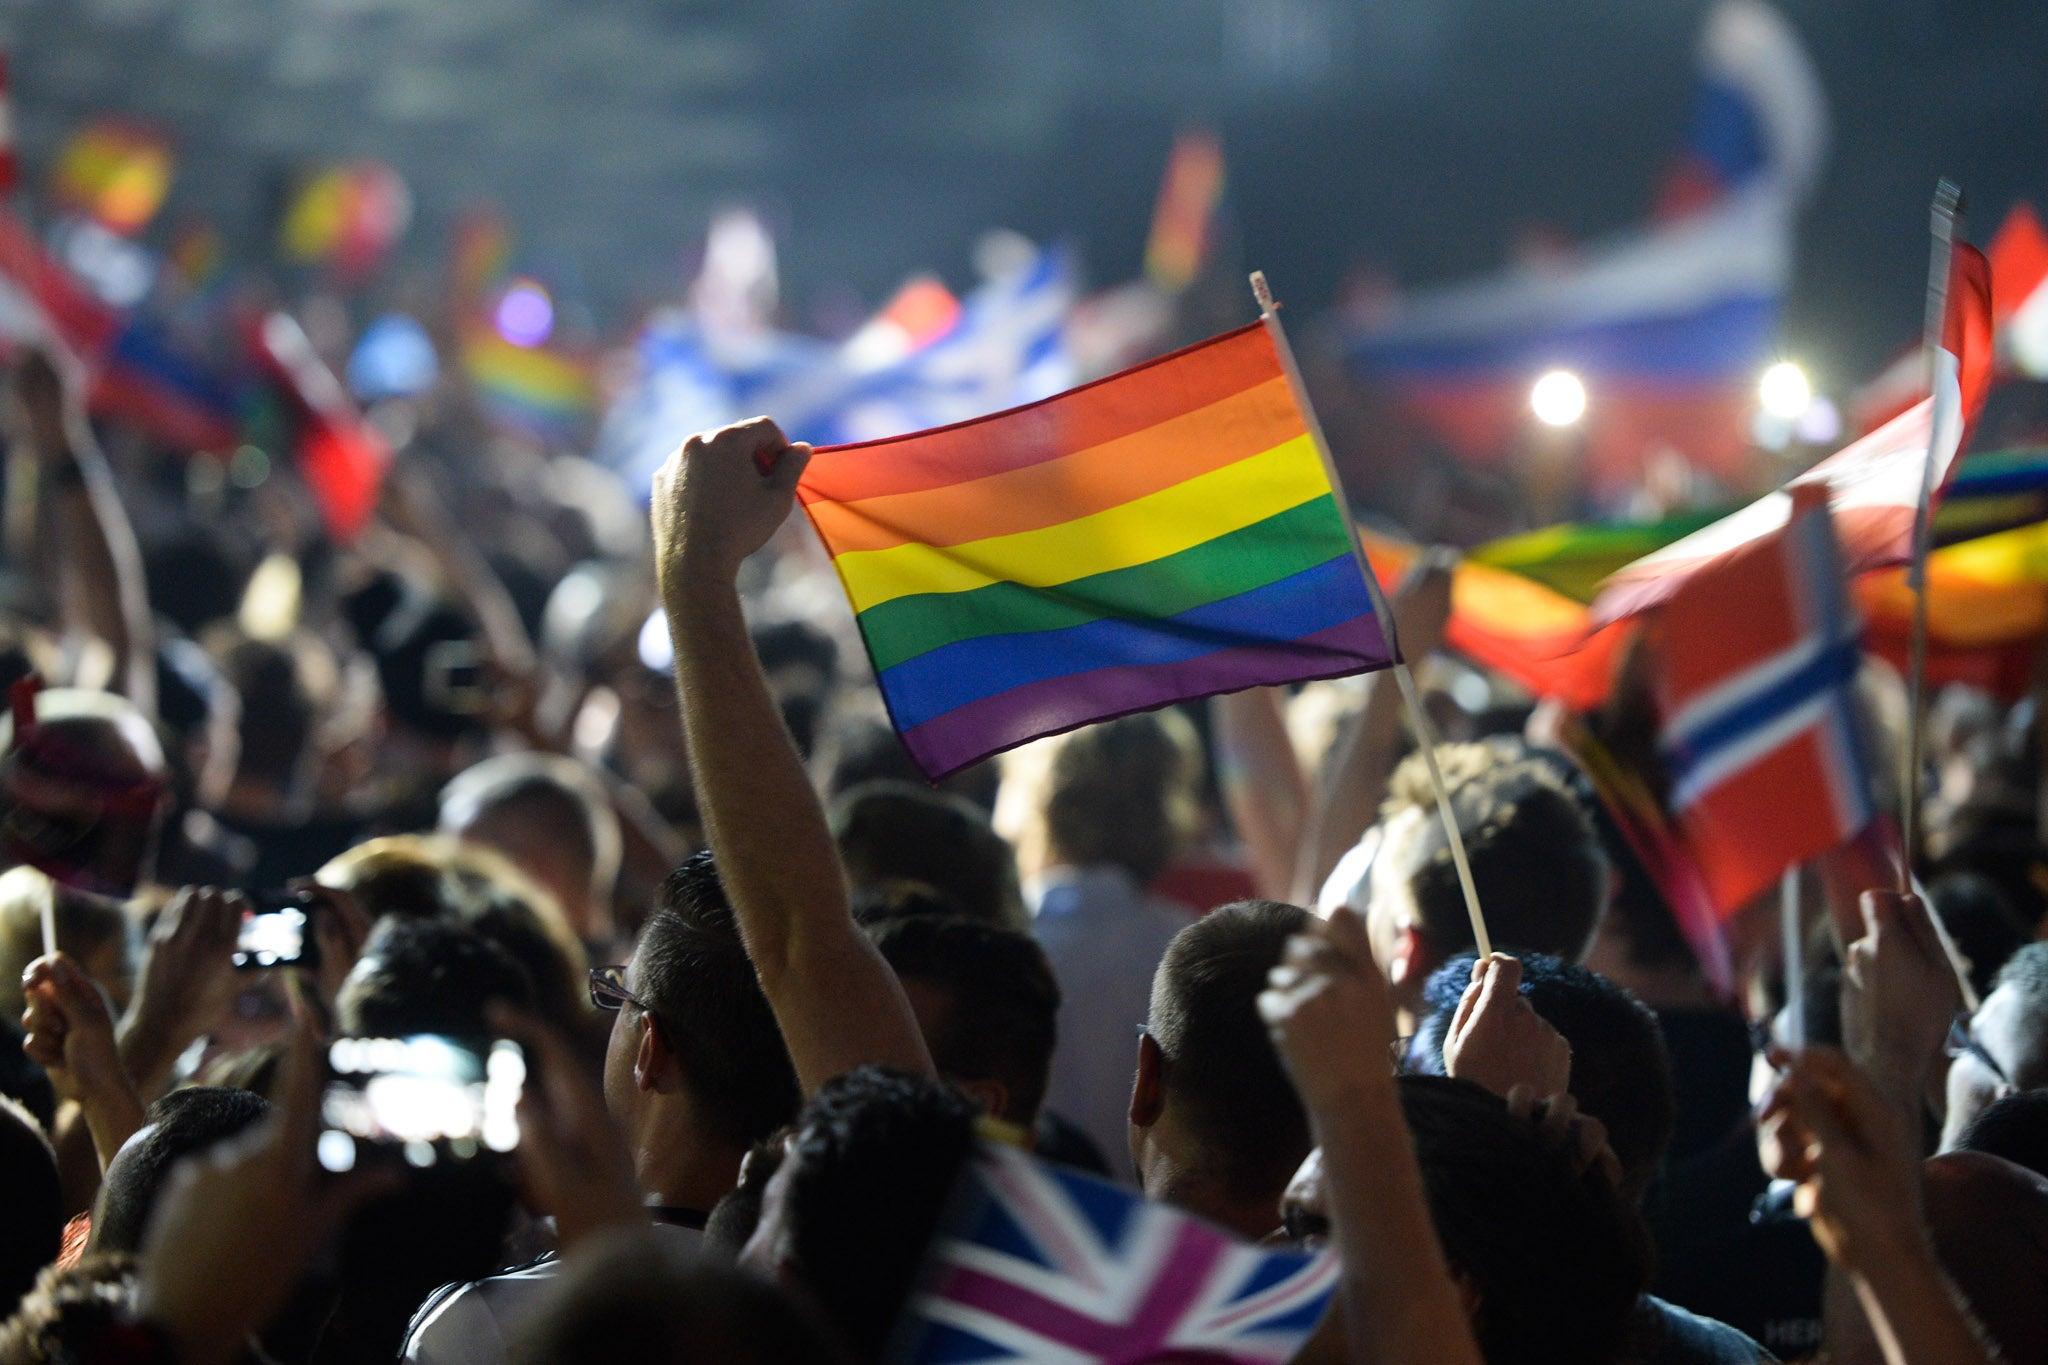 Dating Μελβούρνη γκέι δωρεάν ιστοσελίδες γνωριμιών στην Ουγκάντα